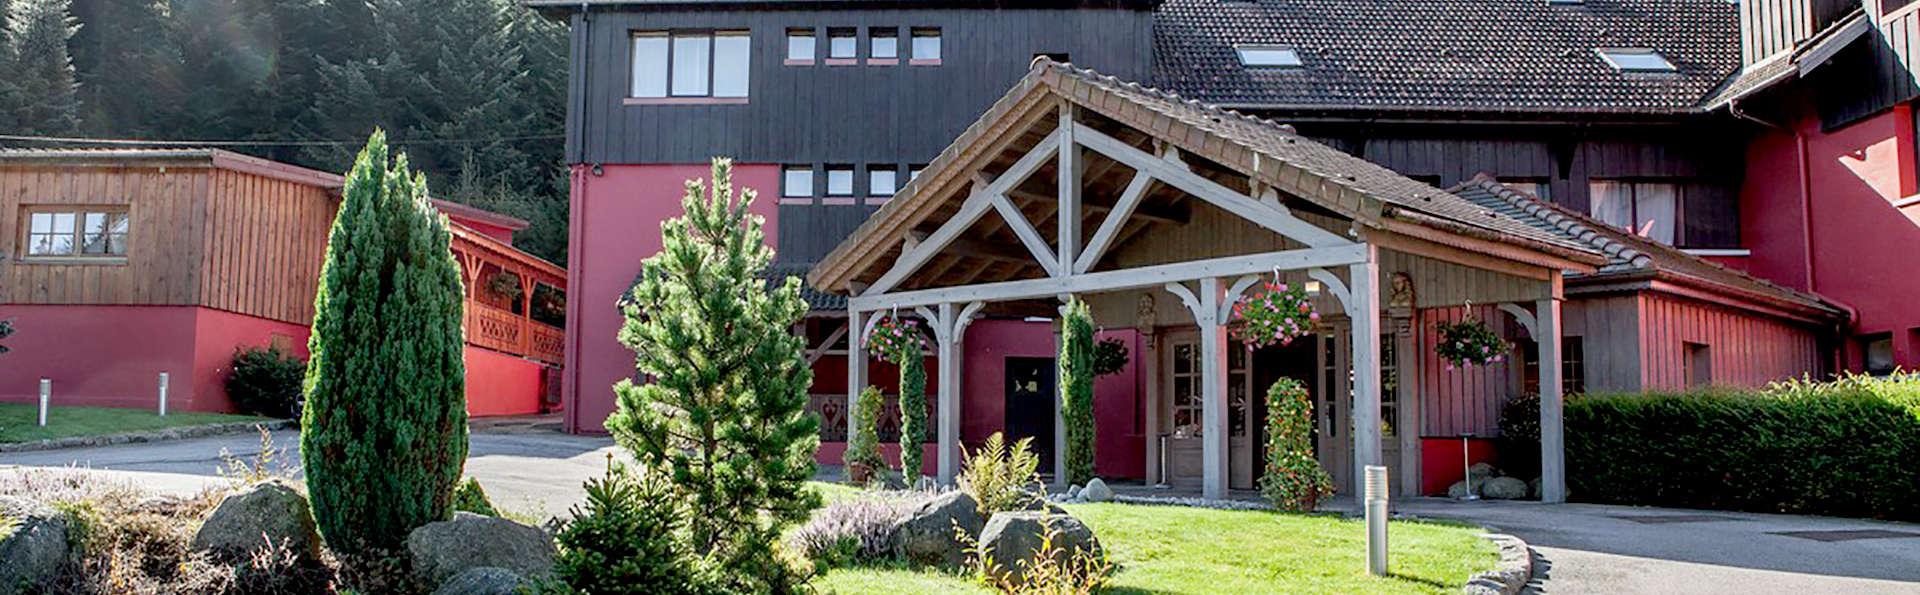 les jardins de sophie 4 xonrupt longemer frankrijk. Black Bedroom Furniture Sets. Home Design Ideas